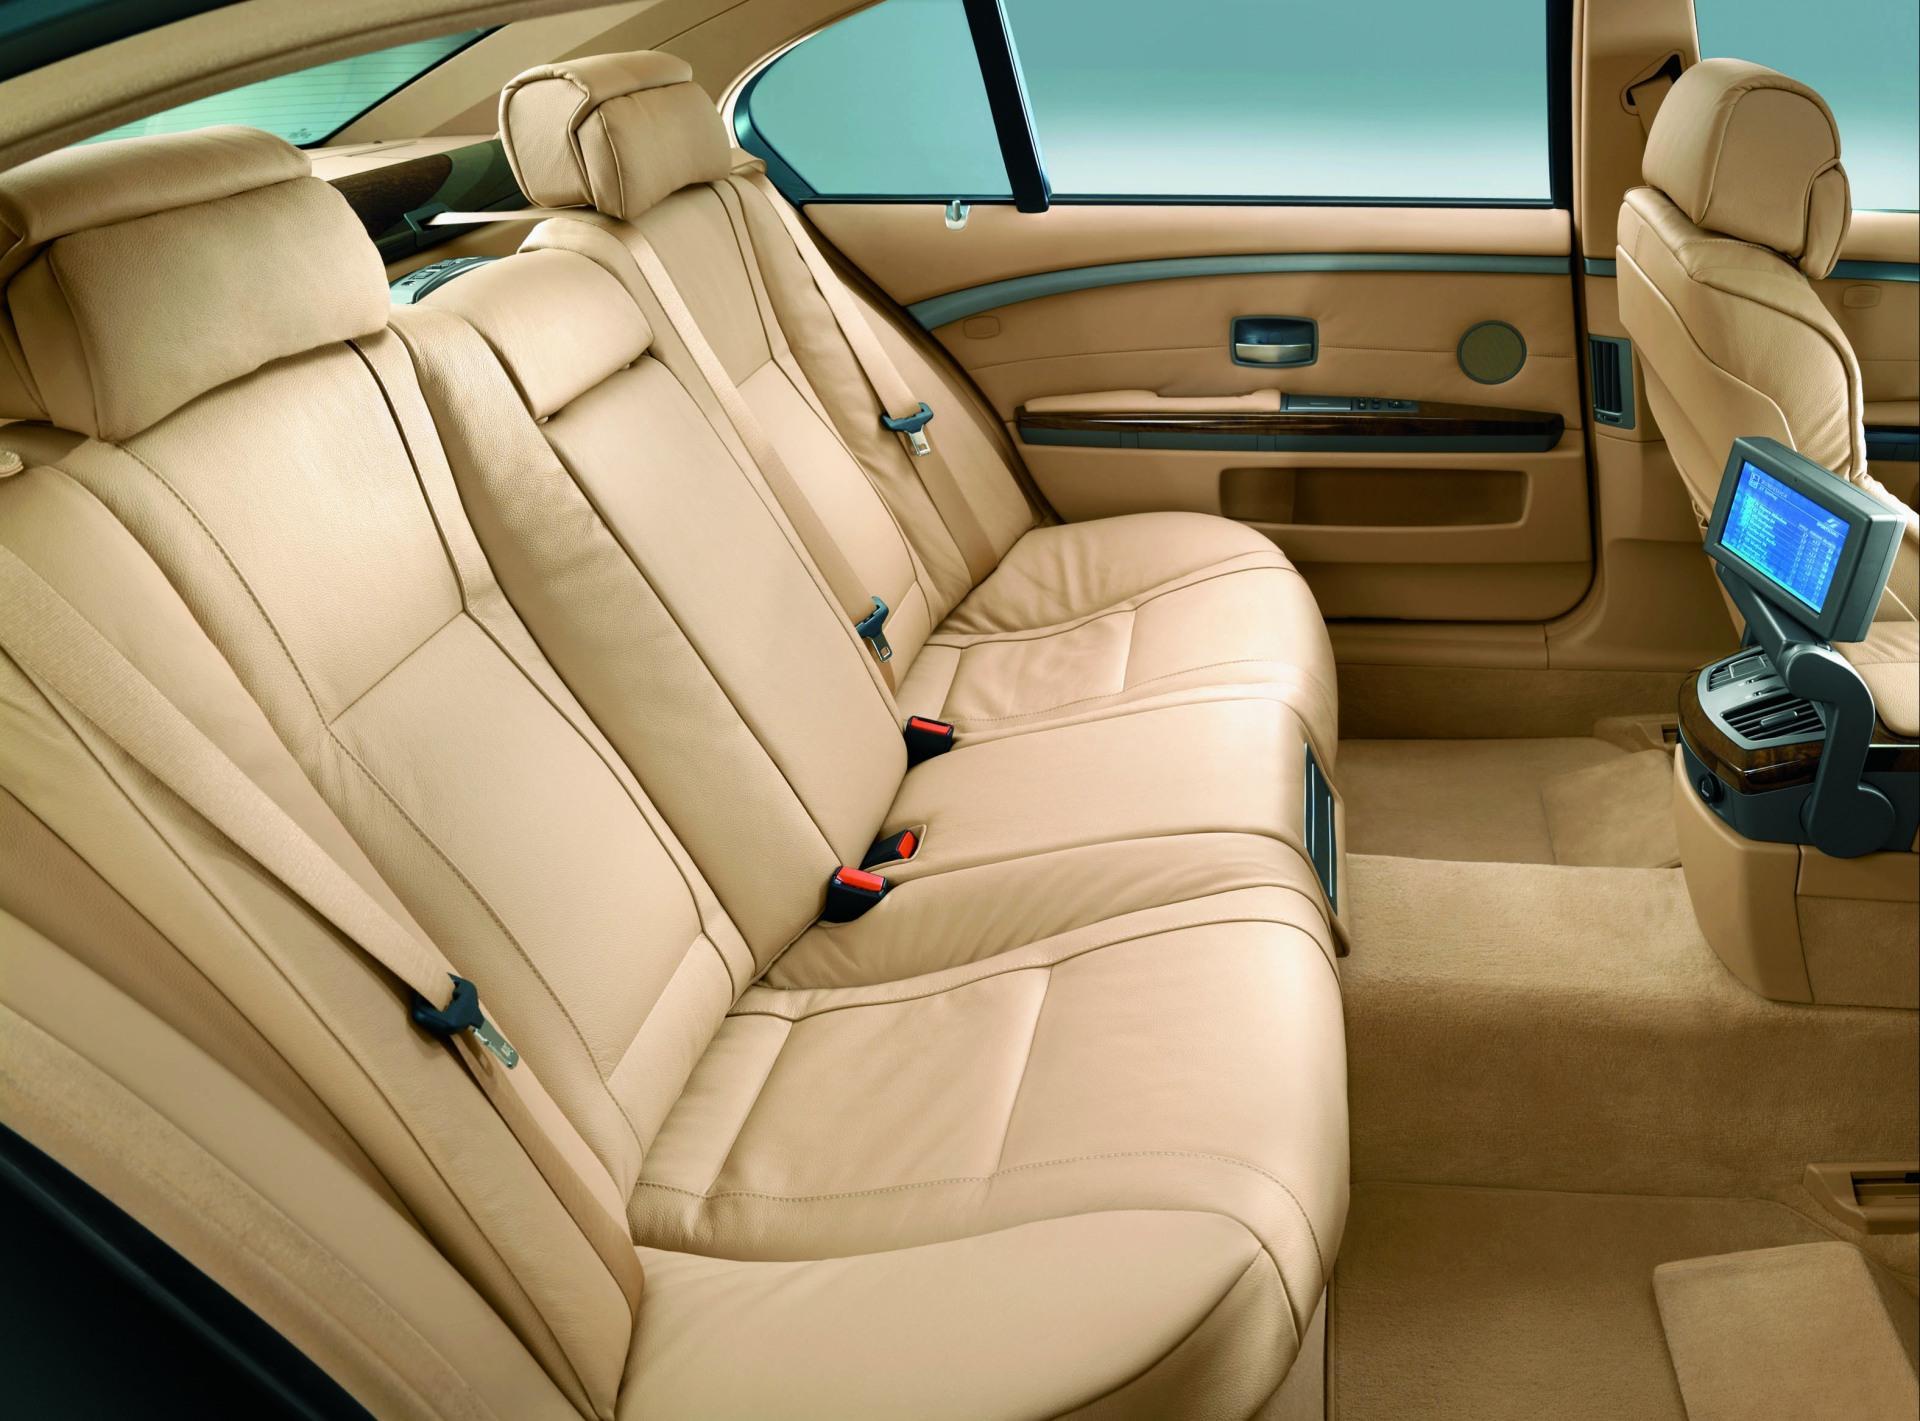 Bmw 7 series 2009 rear seats бесплатно